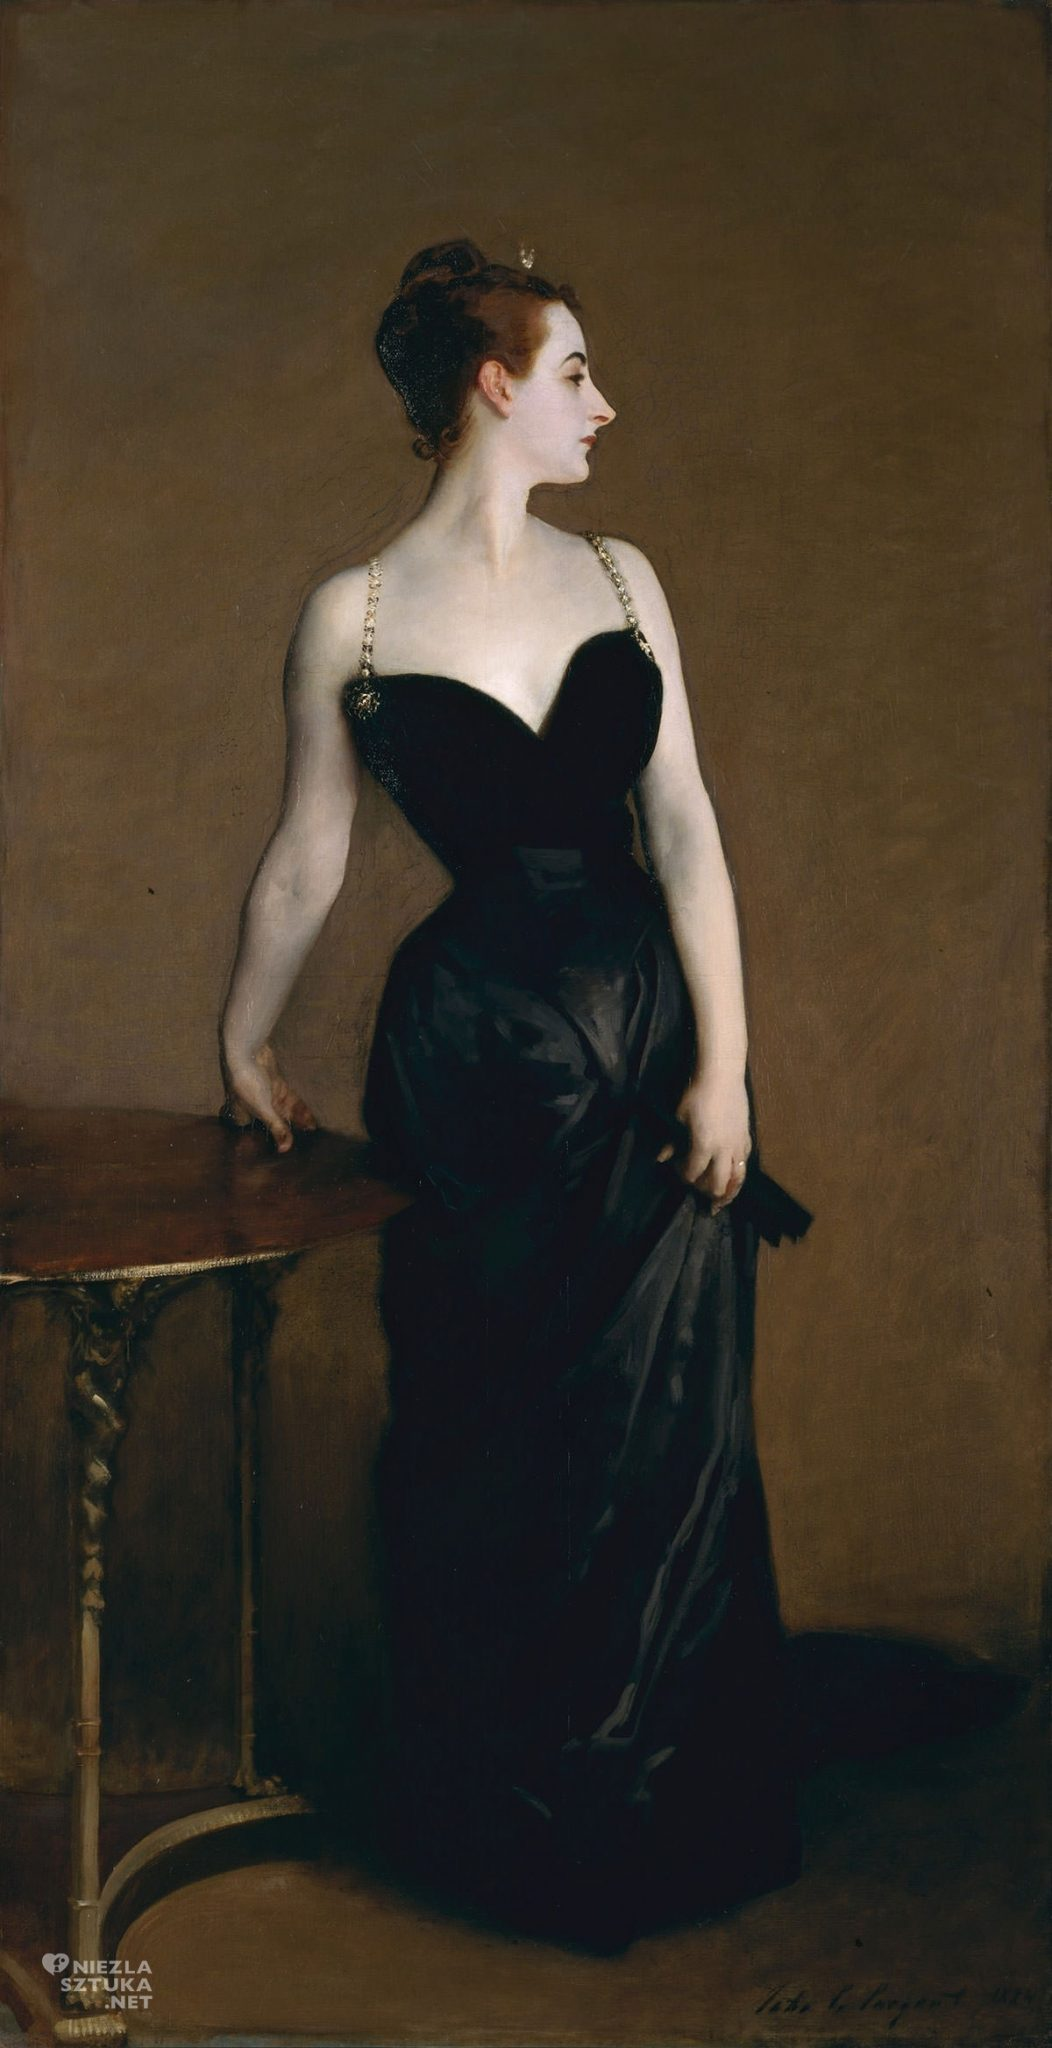 Portret Madame X Madame Pierre Gautreau John Singer Sargent Metropolitan Museum of Art, MET, Nowy Jork, Niezła sztuka